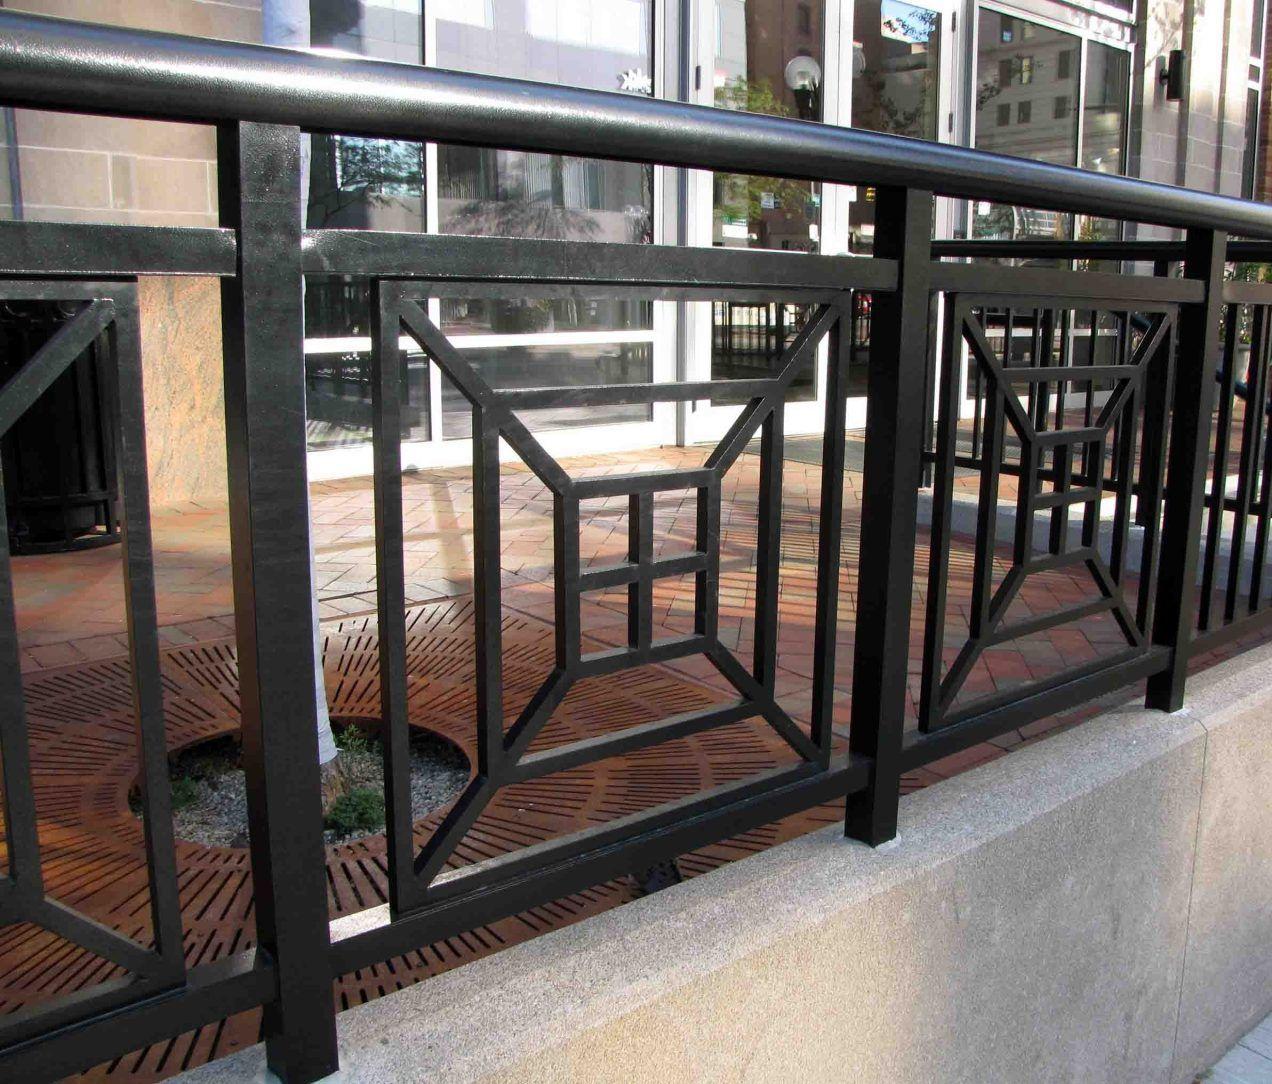 51 Stunning Staircase Design Ideas: Stunning Farmhouse Porch Railing Decor Ideas 51